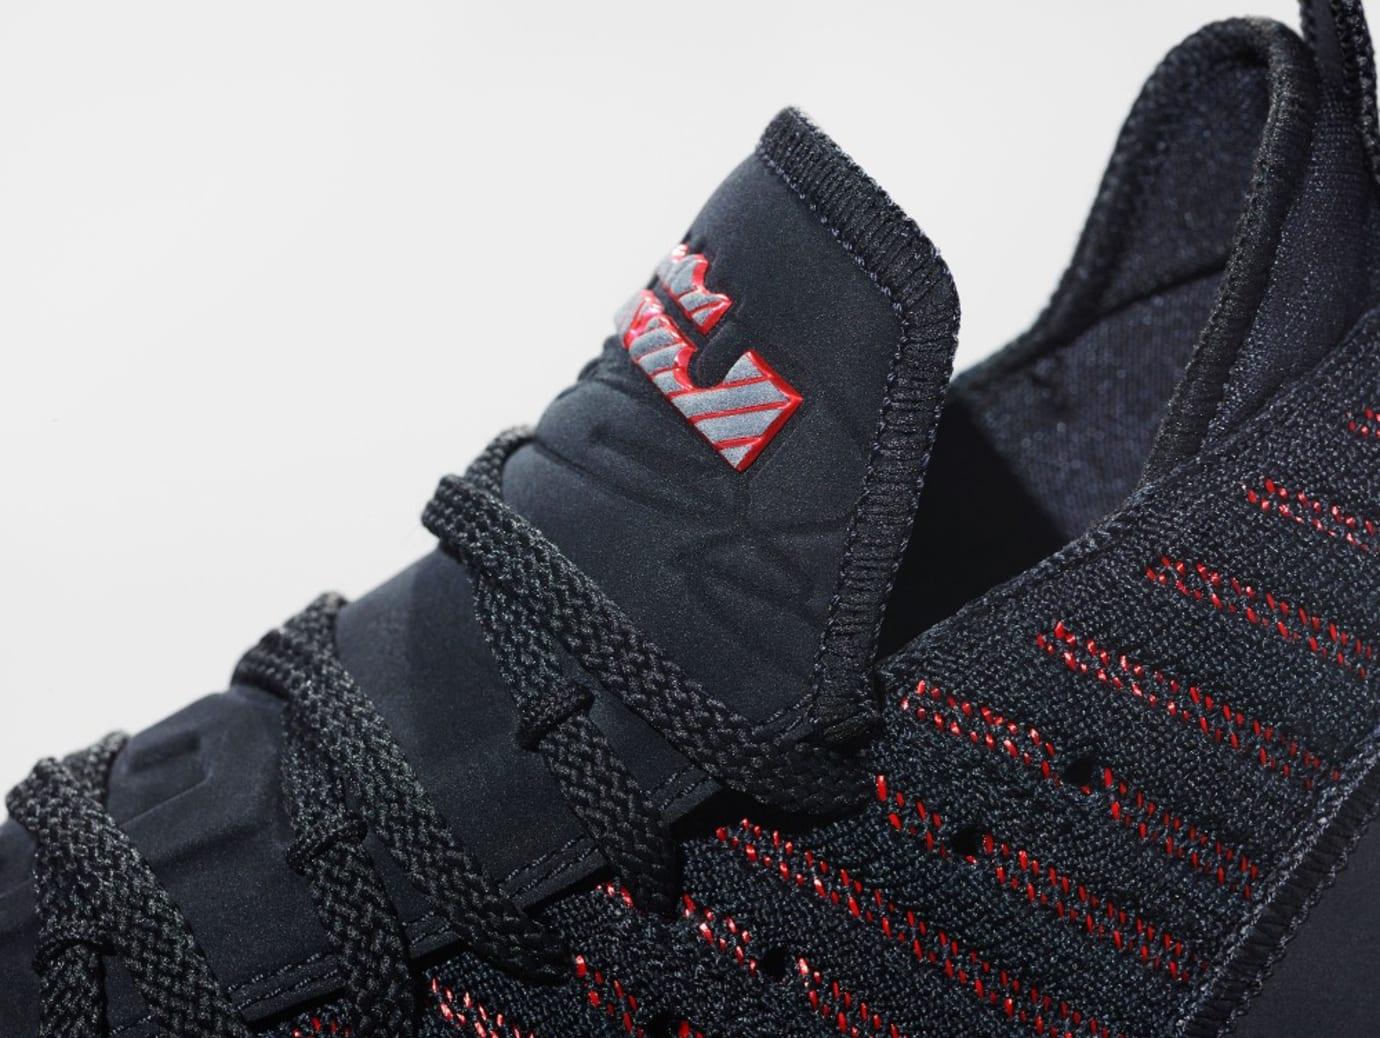 timeless design c8630 b6f75 Nike LeBron 16 'Fresh Bred' AO2588-002 Release Date | Sole ...